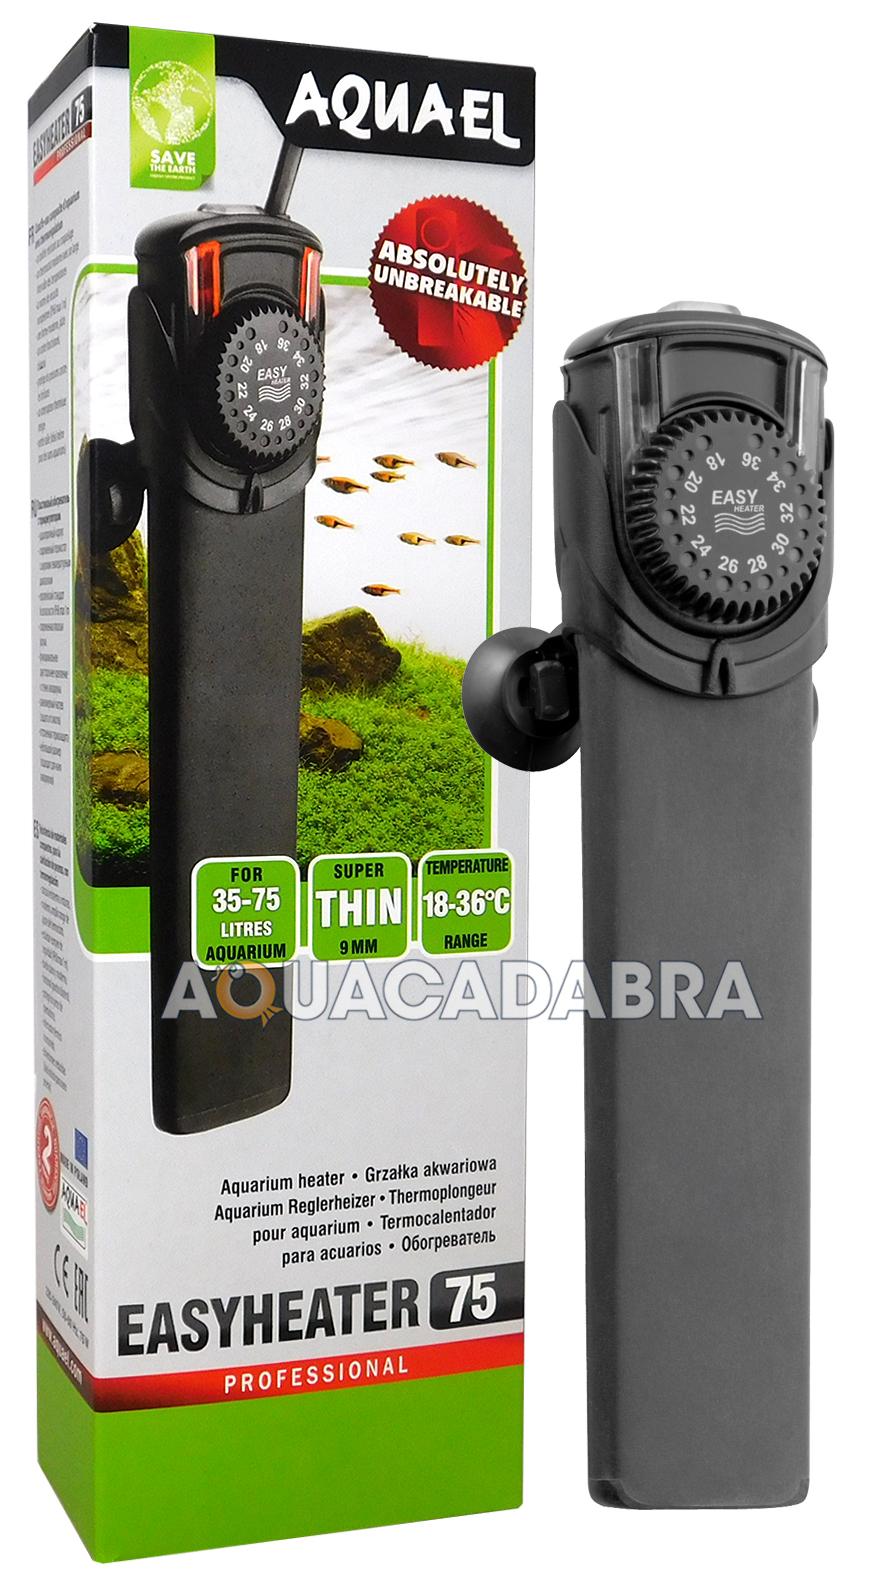 Aquarium fish tank ebay - Aquael Easy Heaters Advanced 17 36 C Easy Mounting Safety Aquarium Fish Tank